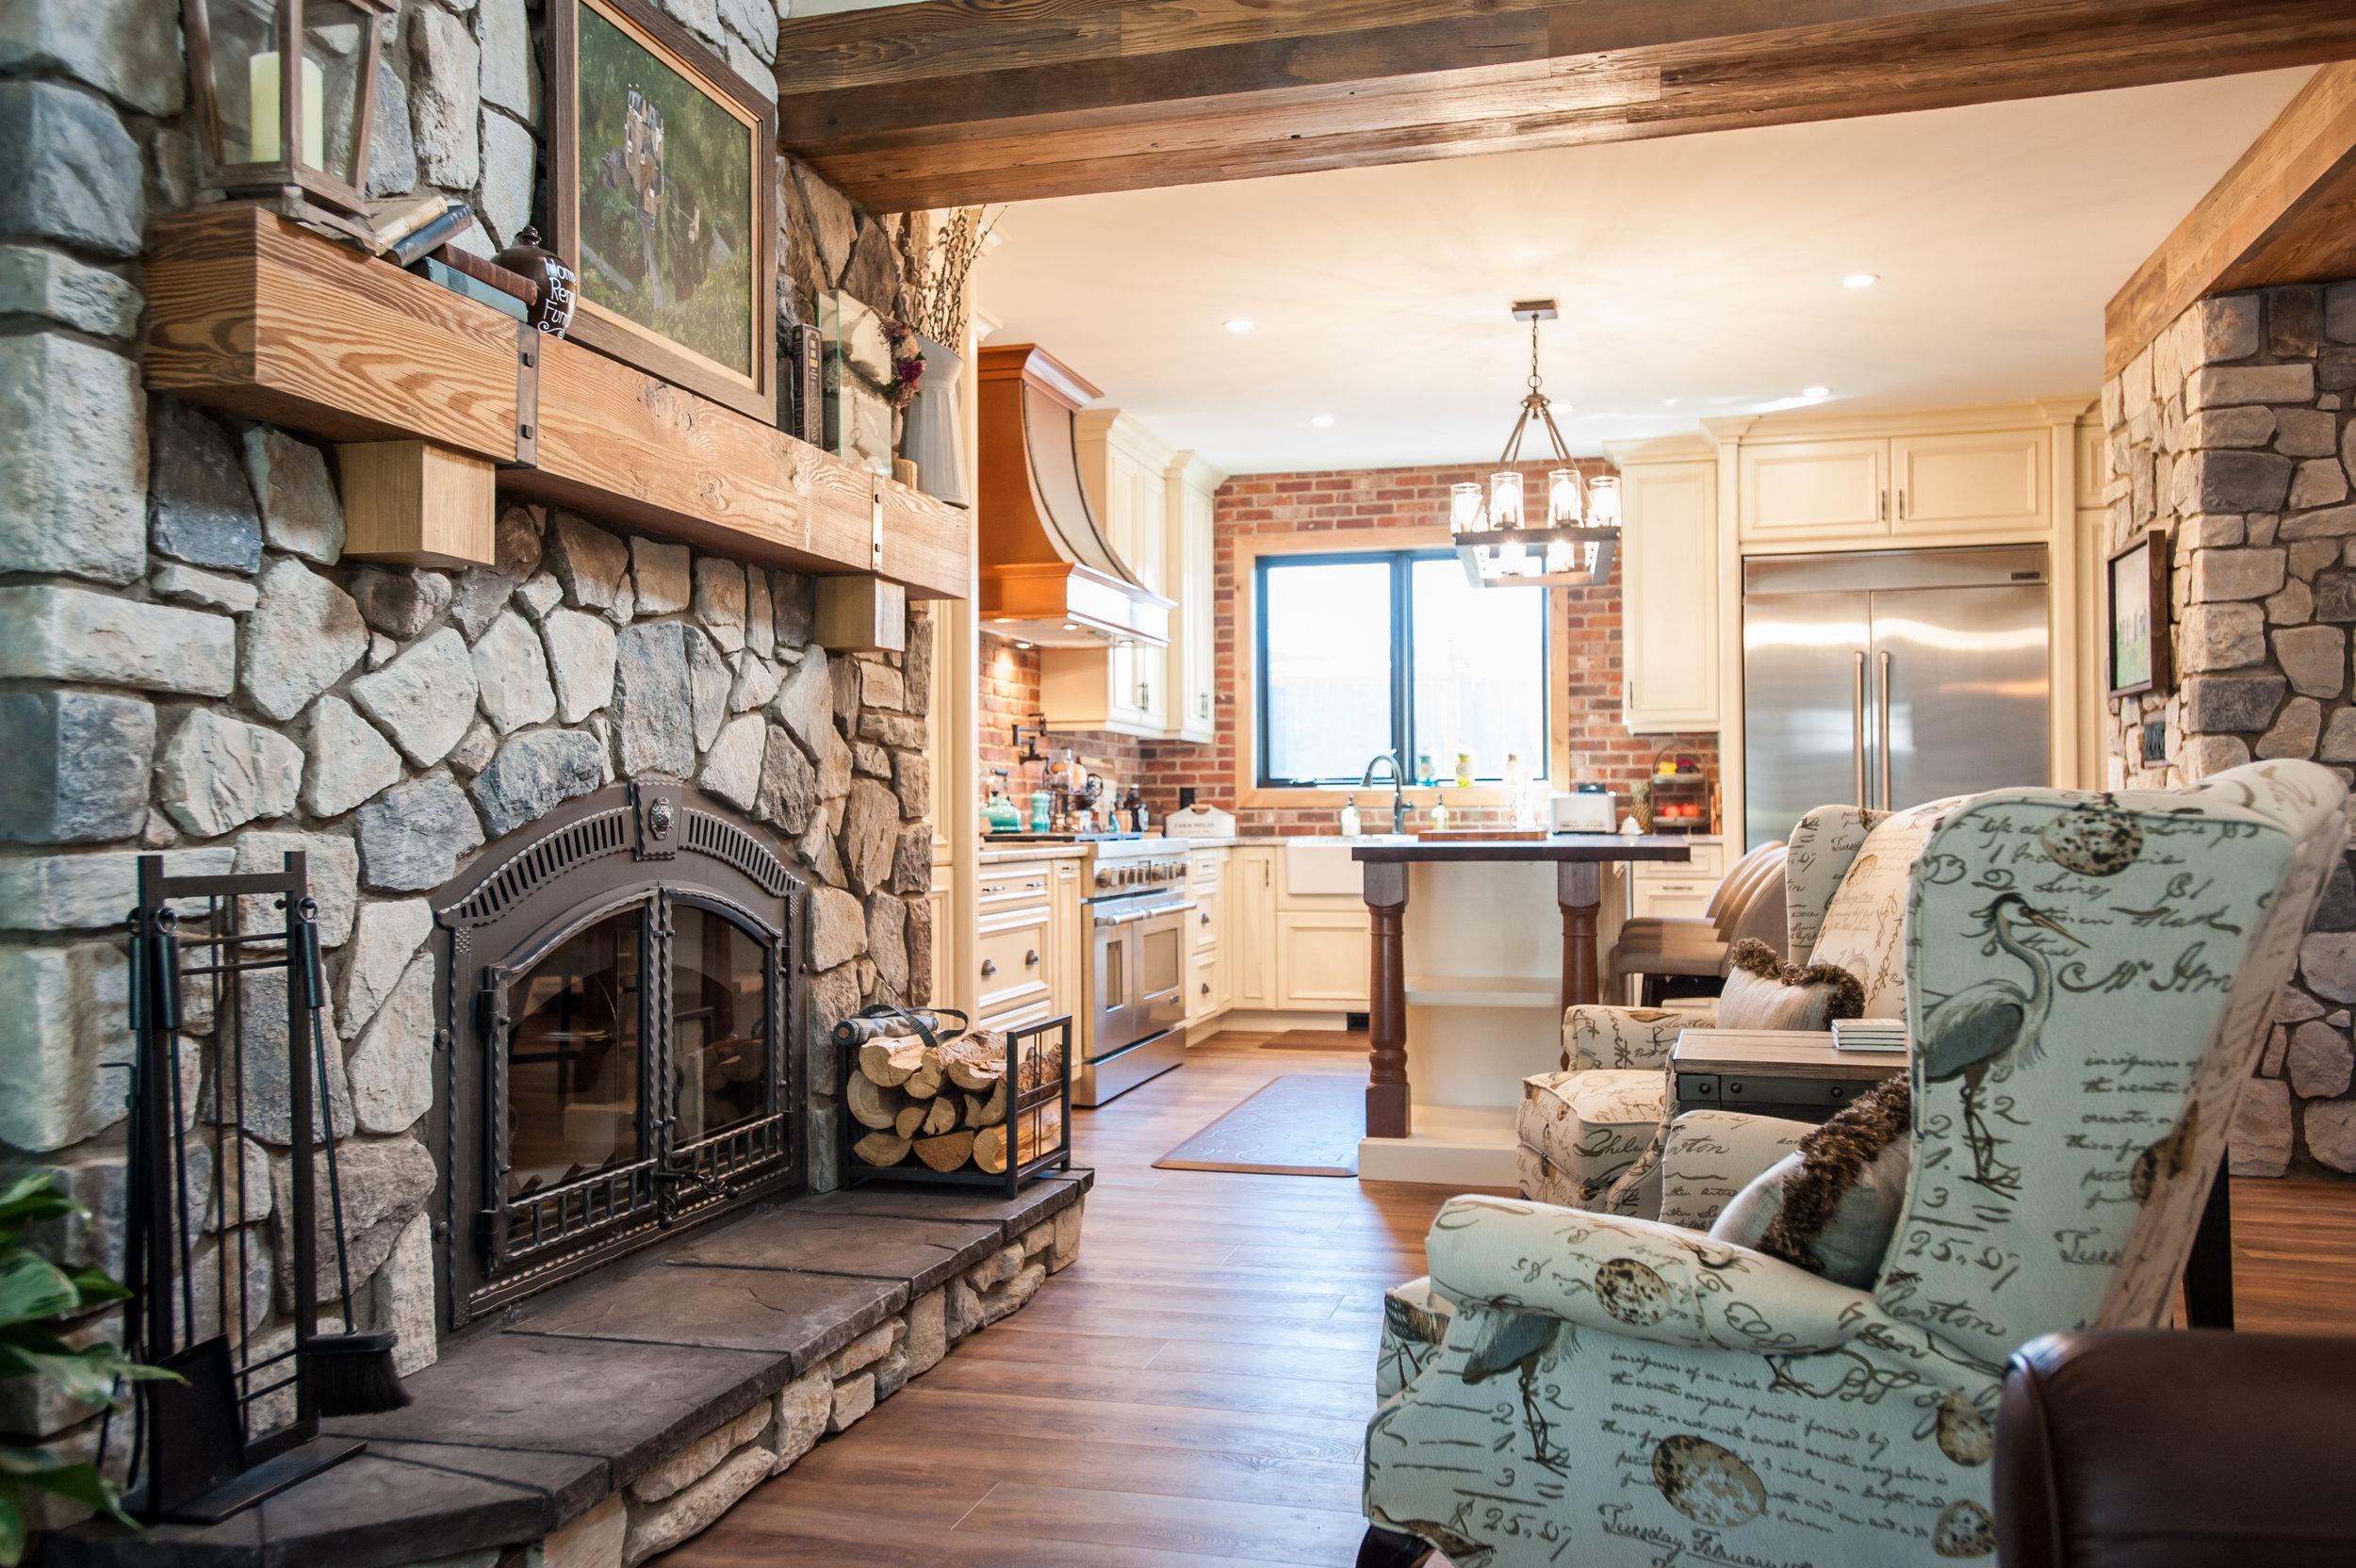 fireplace_stone_wood_mantel_rustic